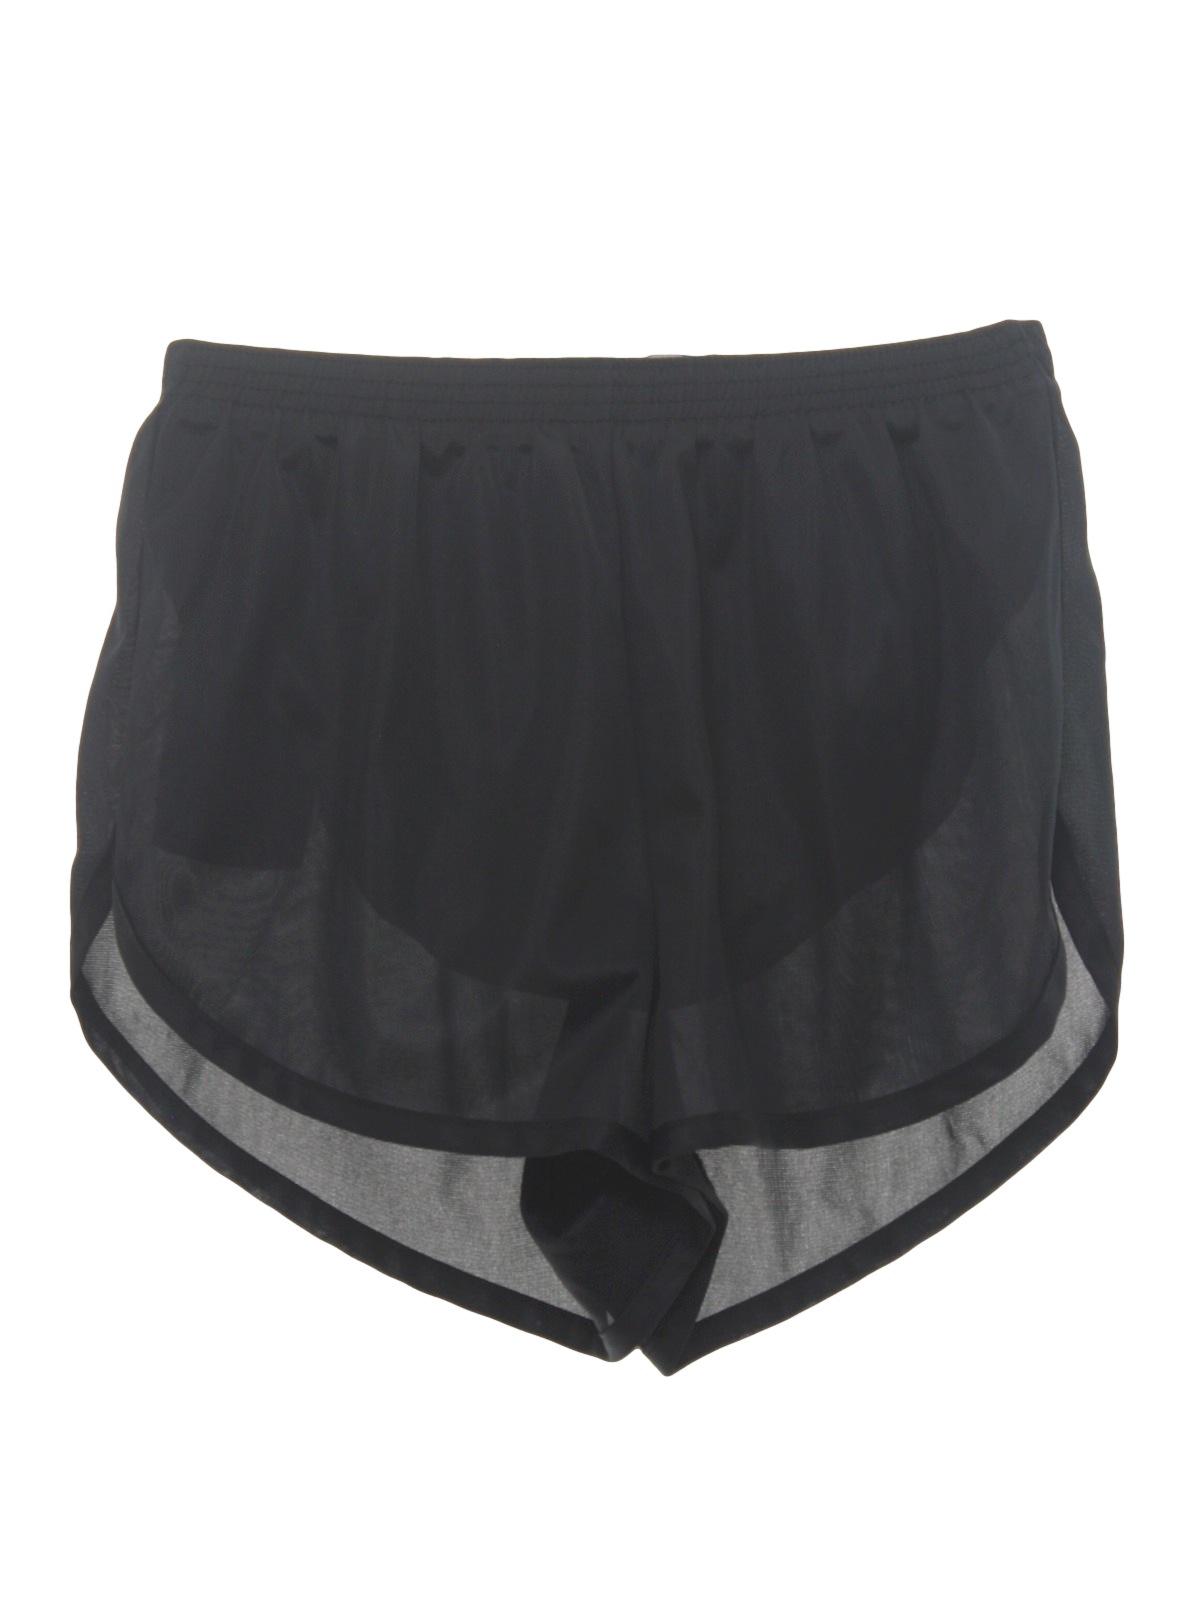 pantyhose pantiehose shorts With